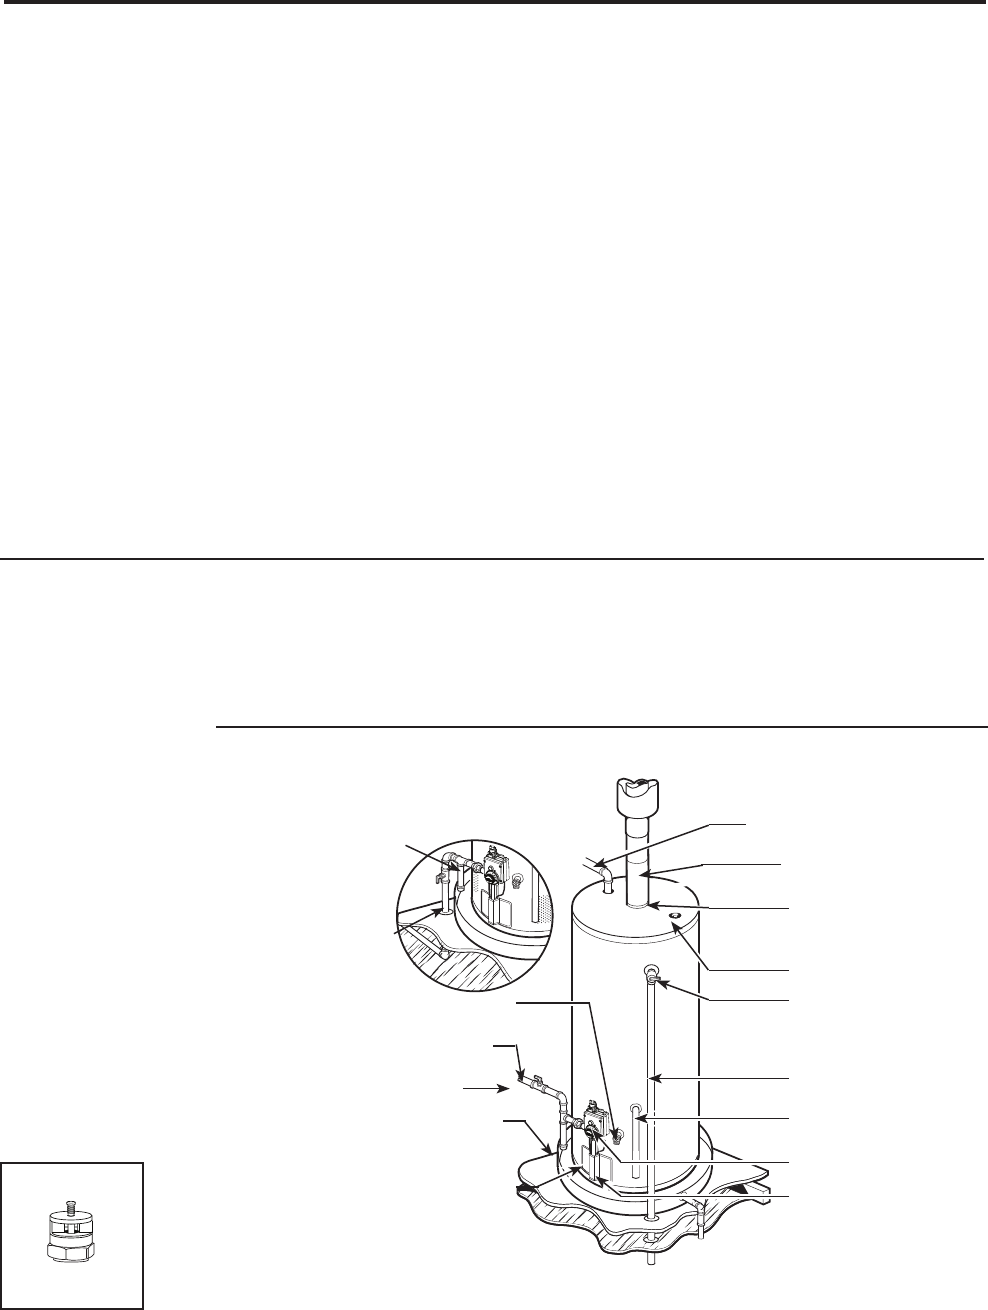 rheem professional classic series direct vent for manufactured Rheem Furnace Diagram 11